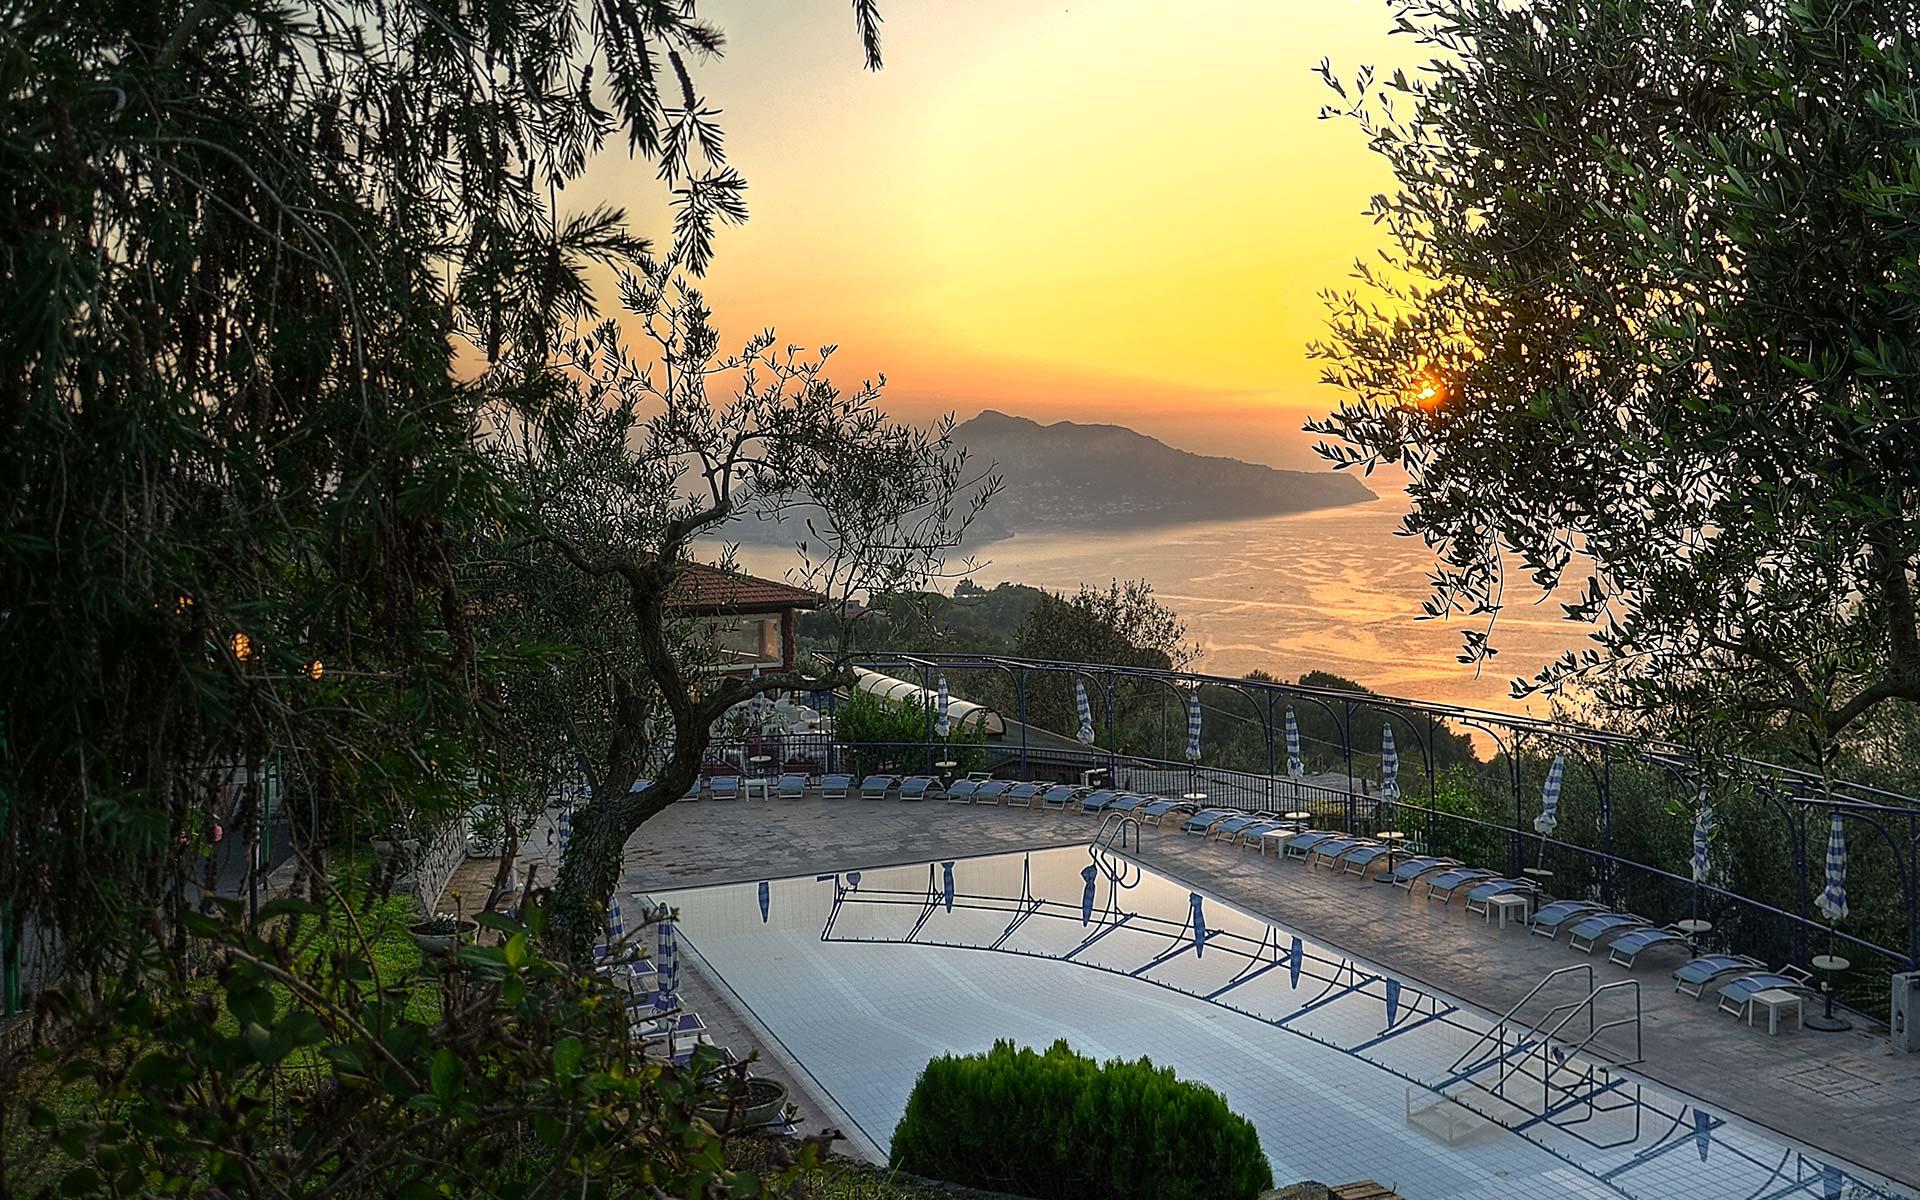 resort-gocce-di-capri-discover-sorrento-coast